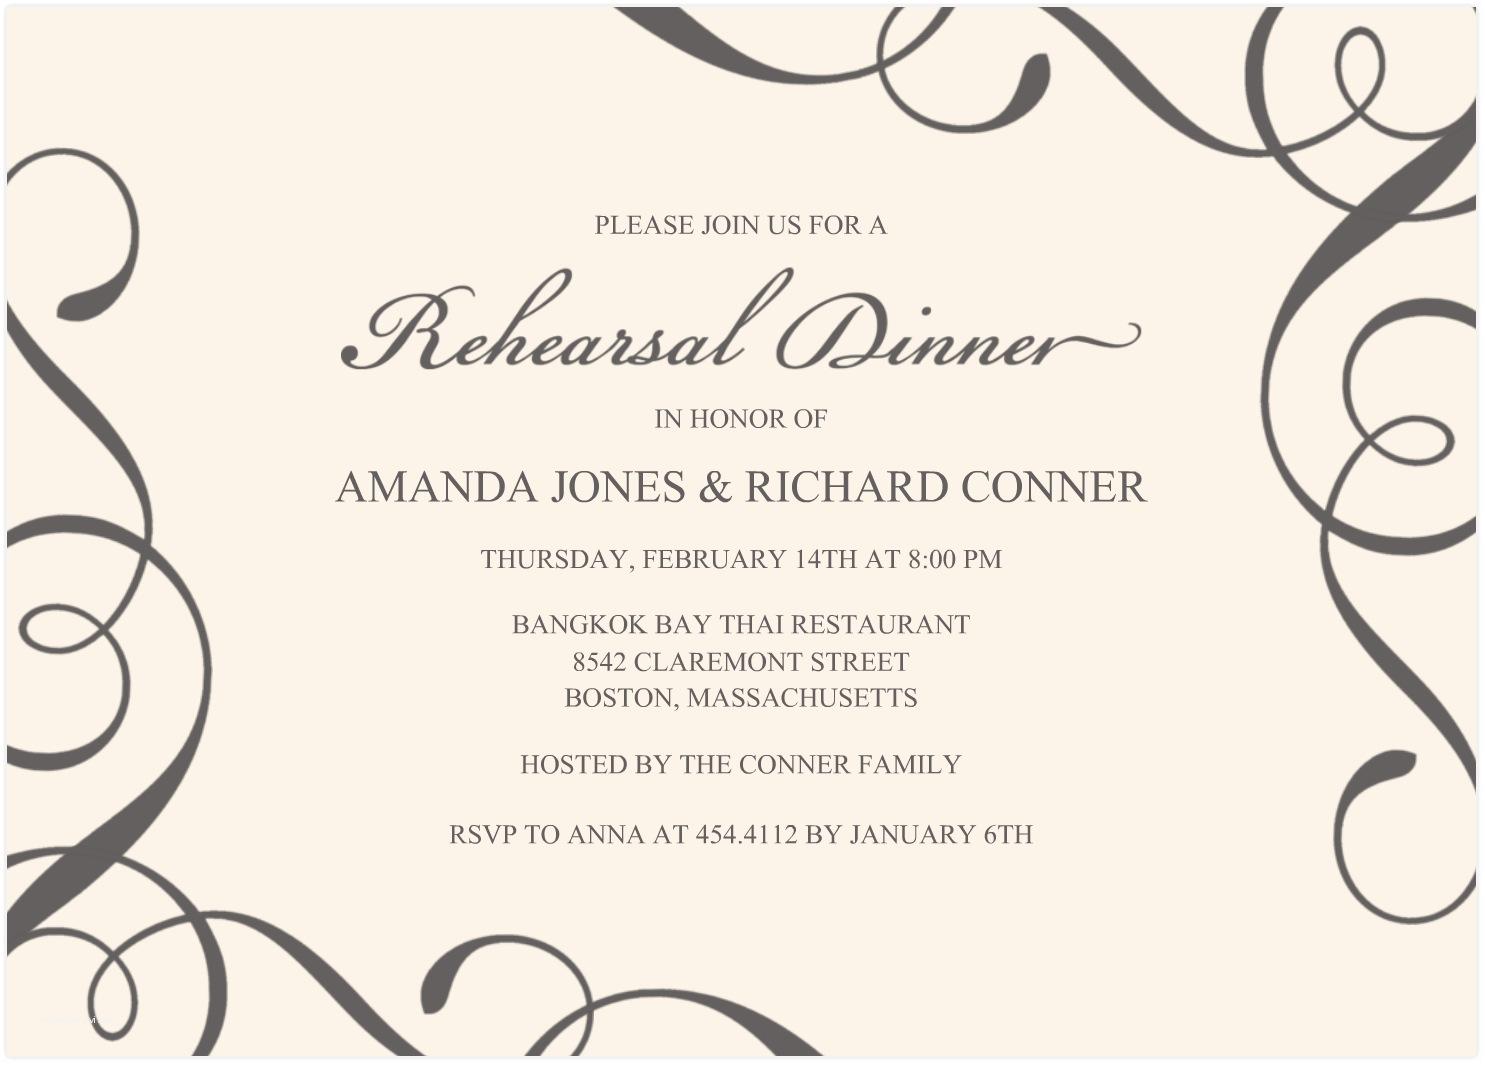 Free Email Wedding Invitation Templates Gala Dinner Invitation Template